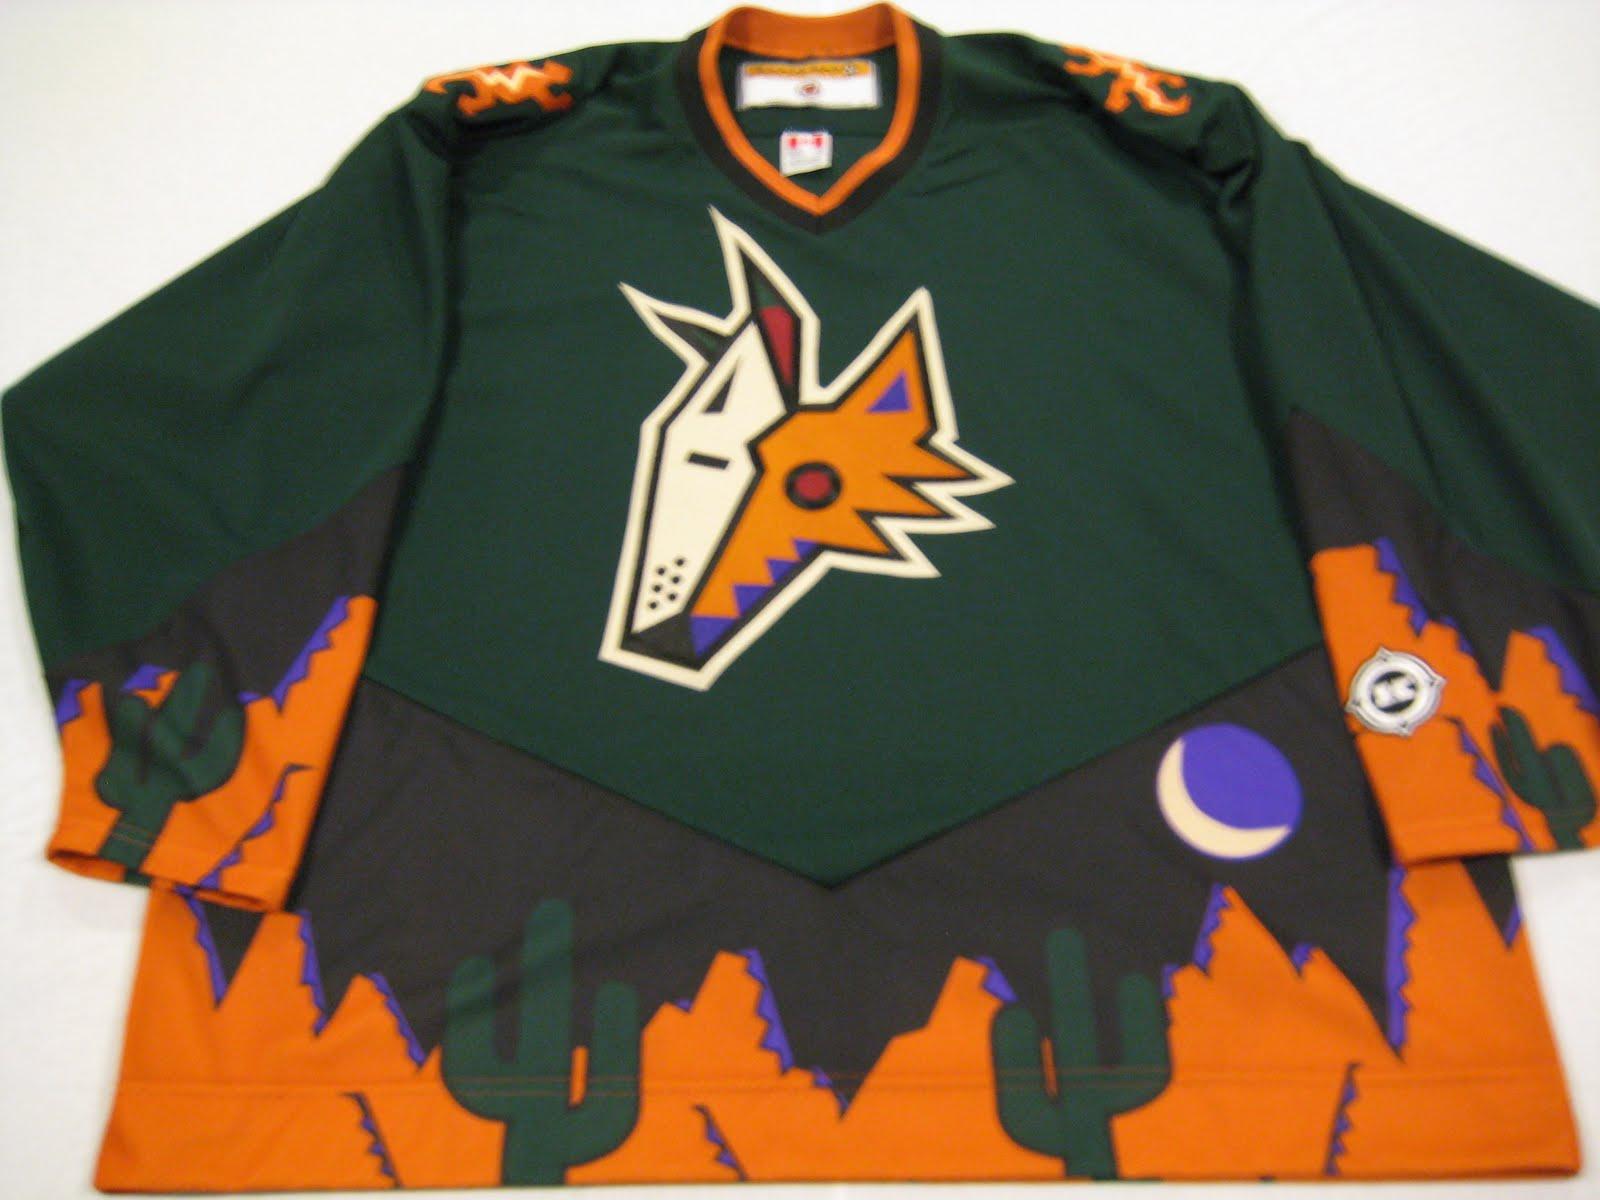 innovative design bbd1c bf871 Bmac's Jerseys: Phoenix Coyotes 98-03 Alternate Jersey